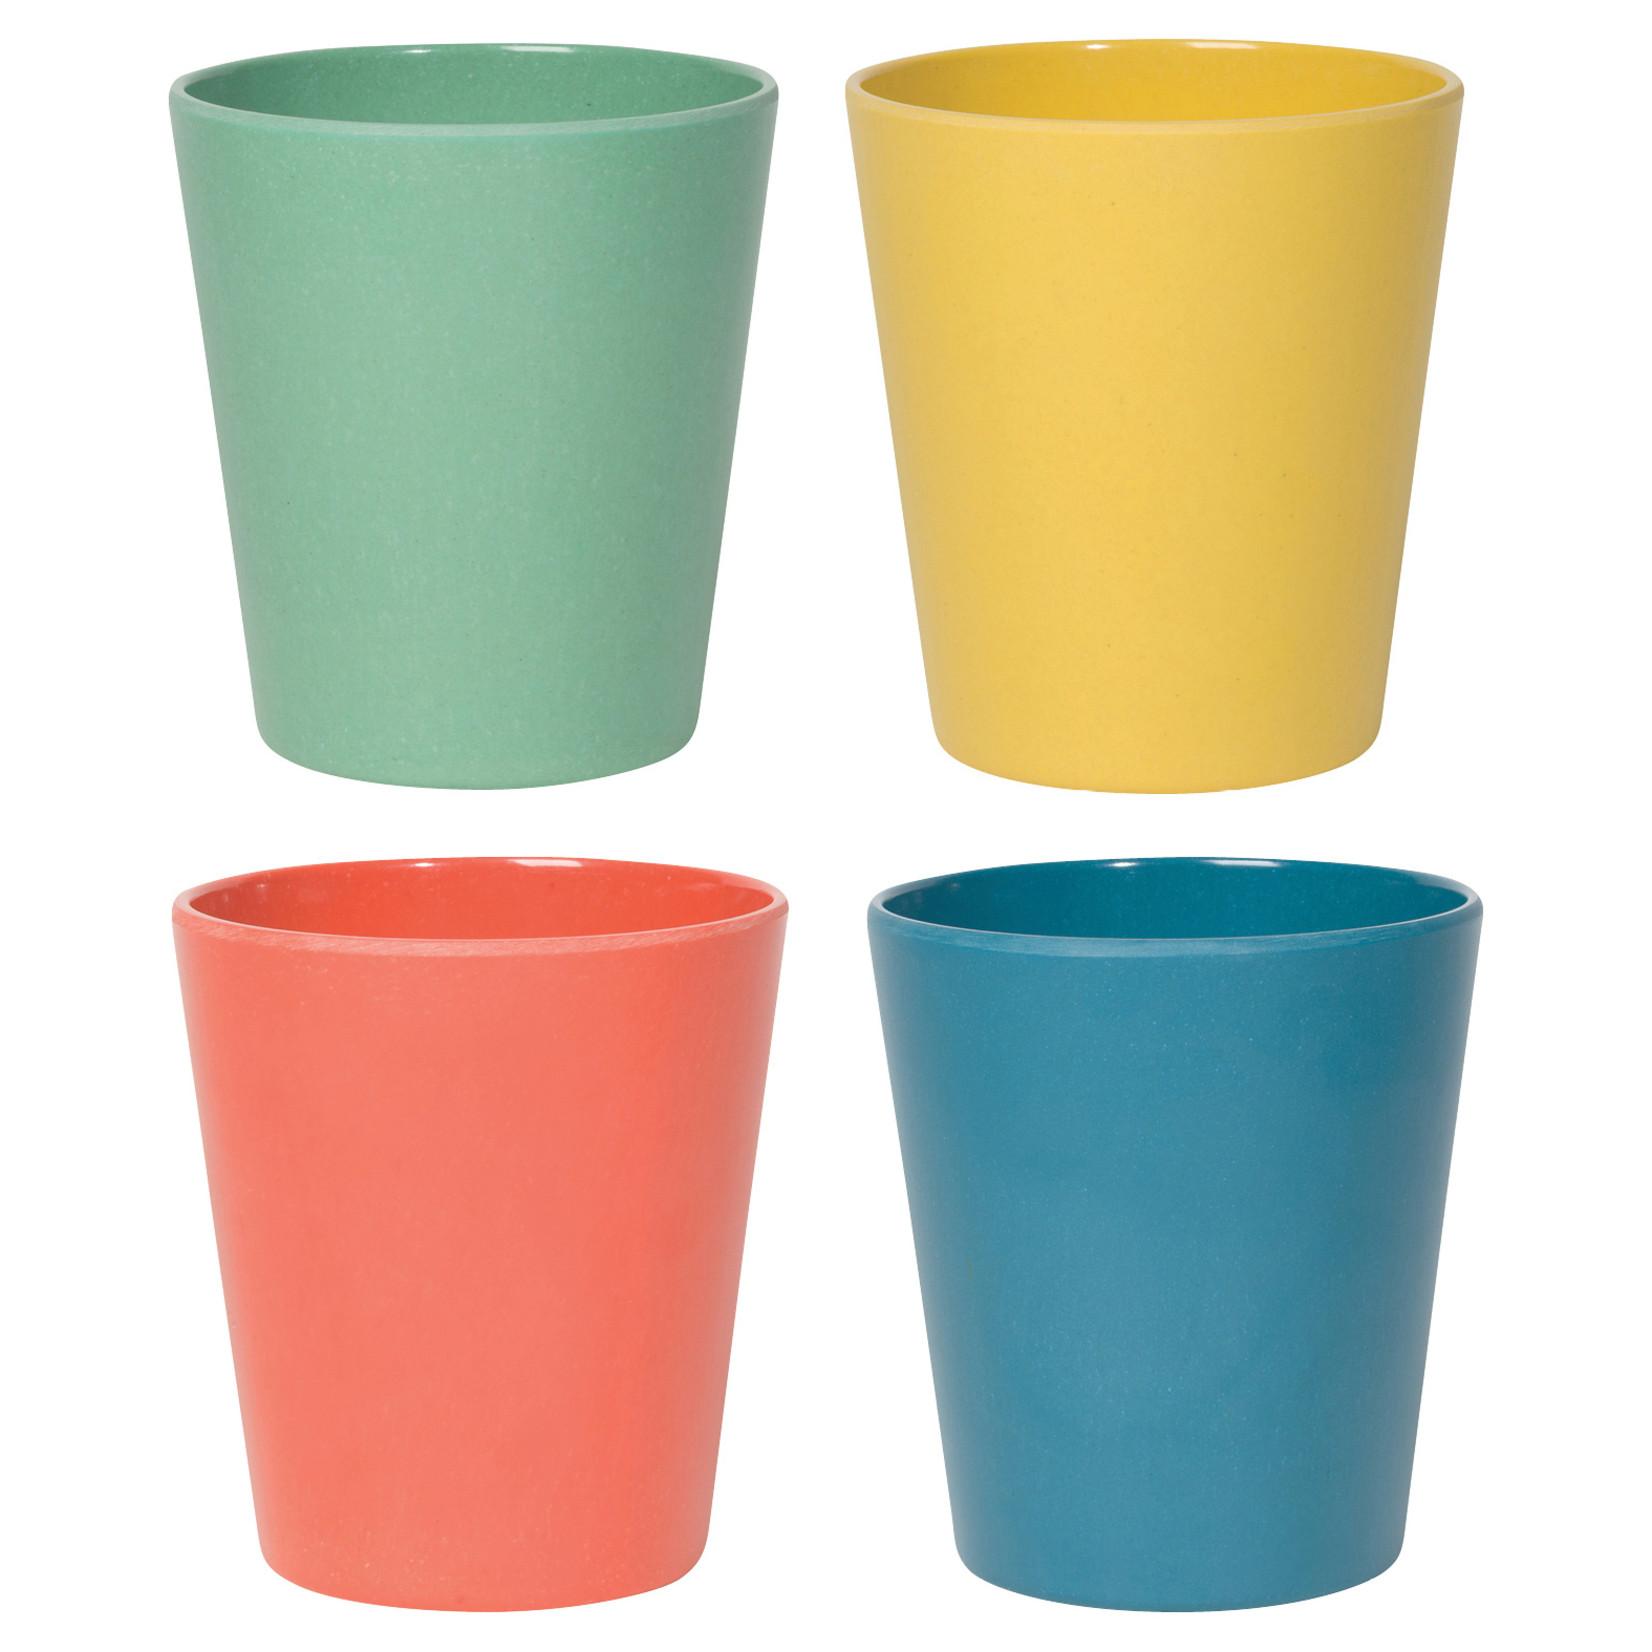 Ecologie Planta Bamboo Cup Set